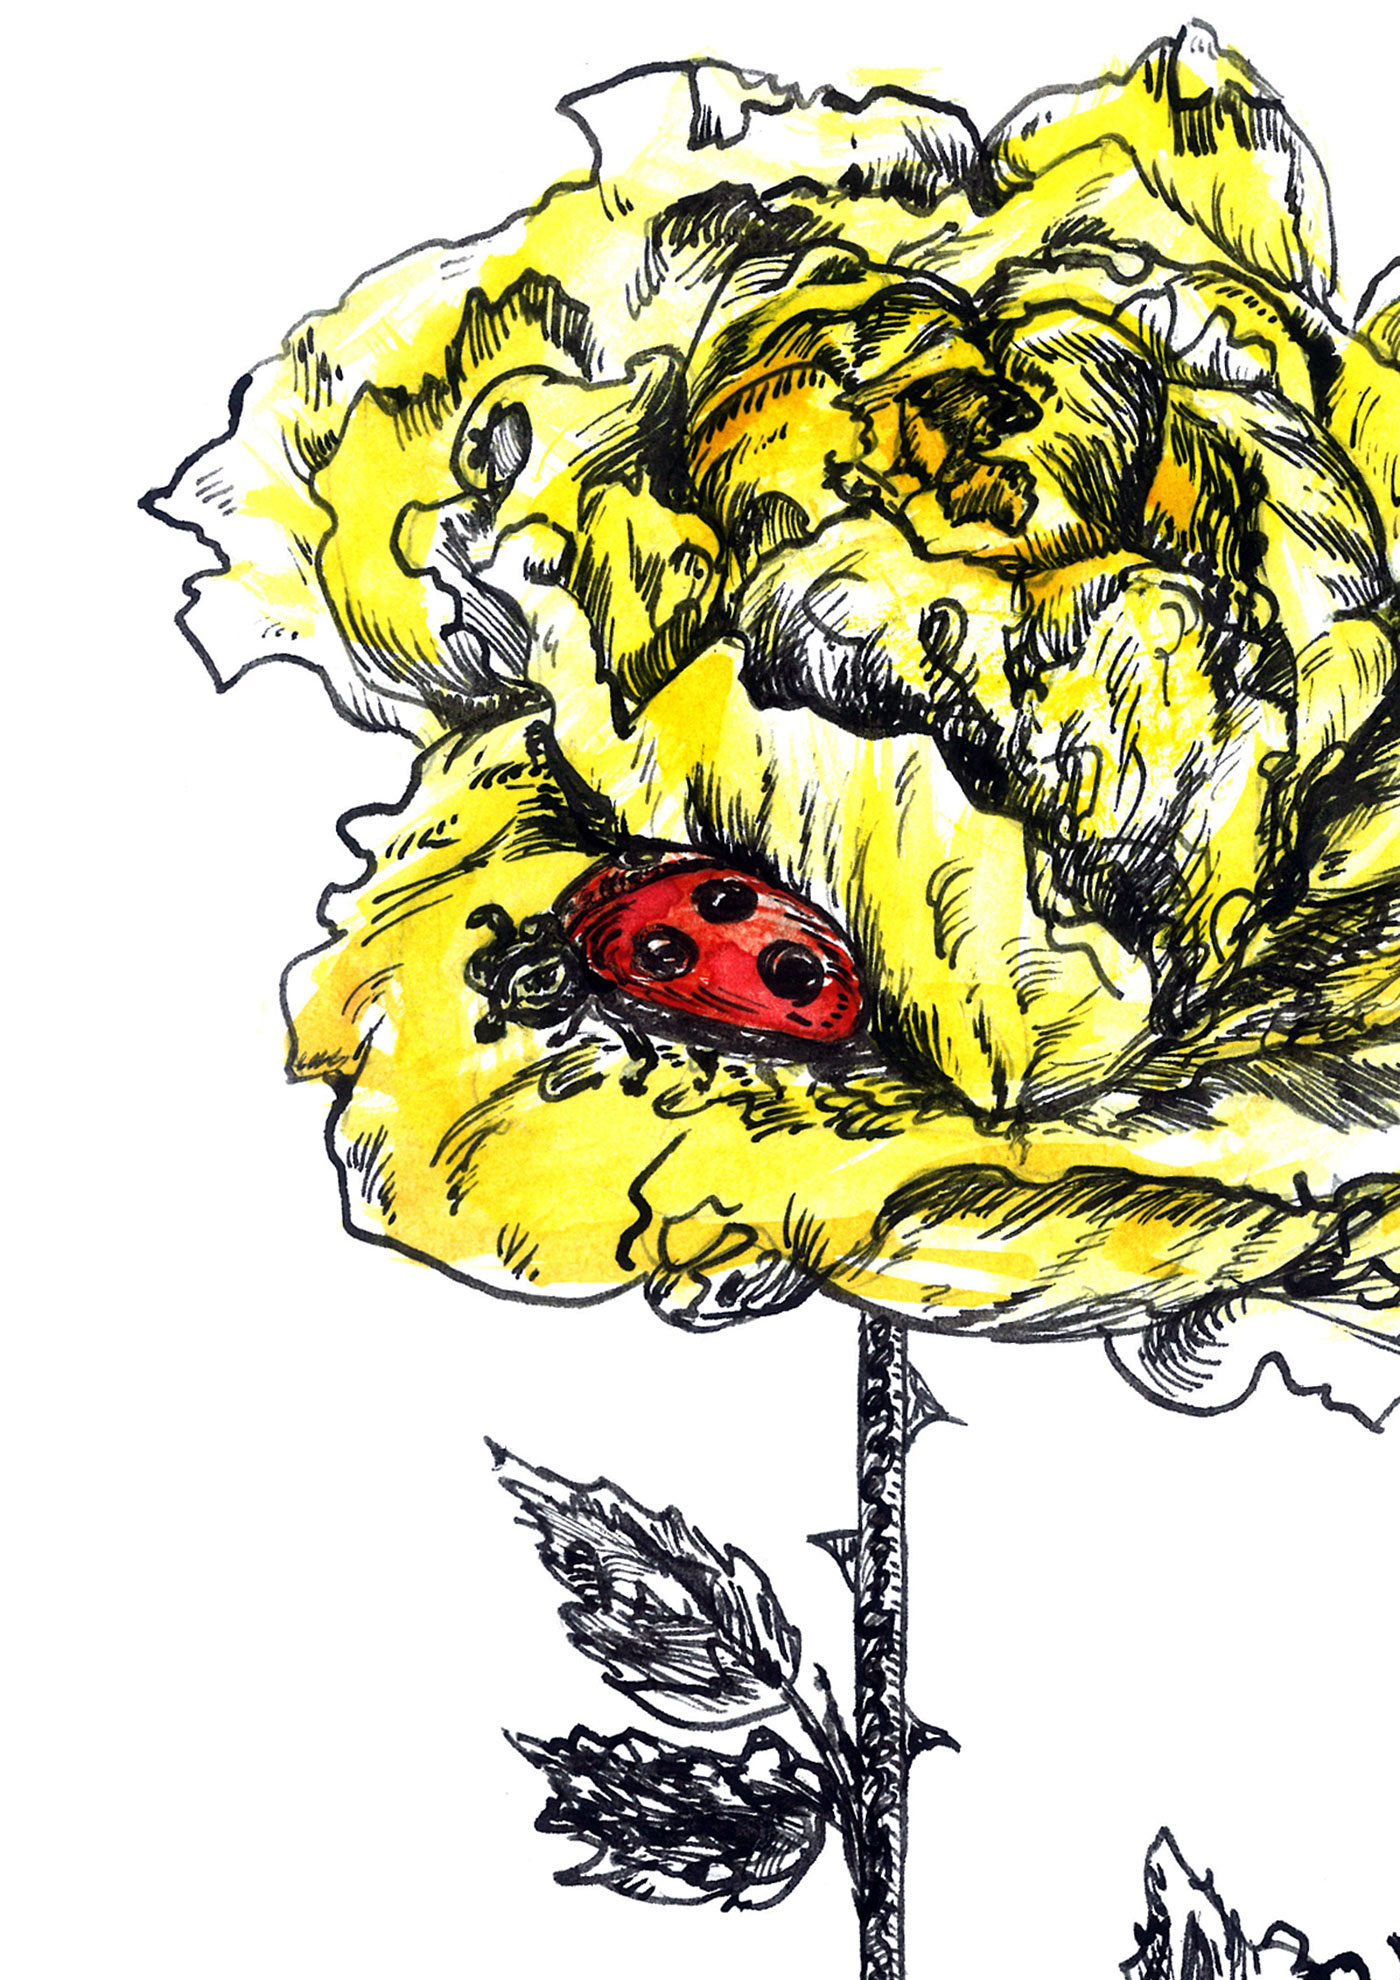 ink artwork rose flower yellow ladybug Drawing  ILLUSTRATION  watercolor Nature